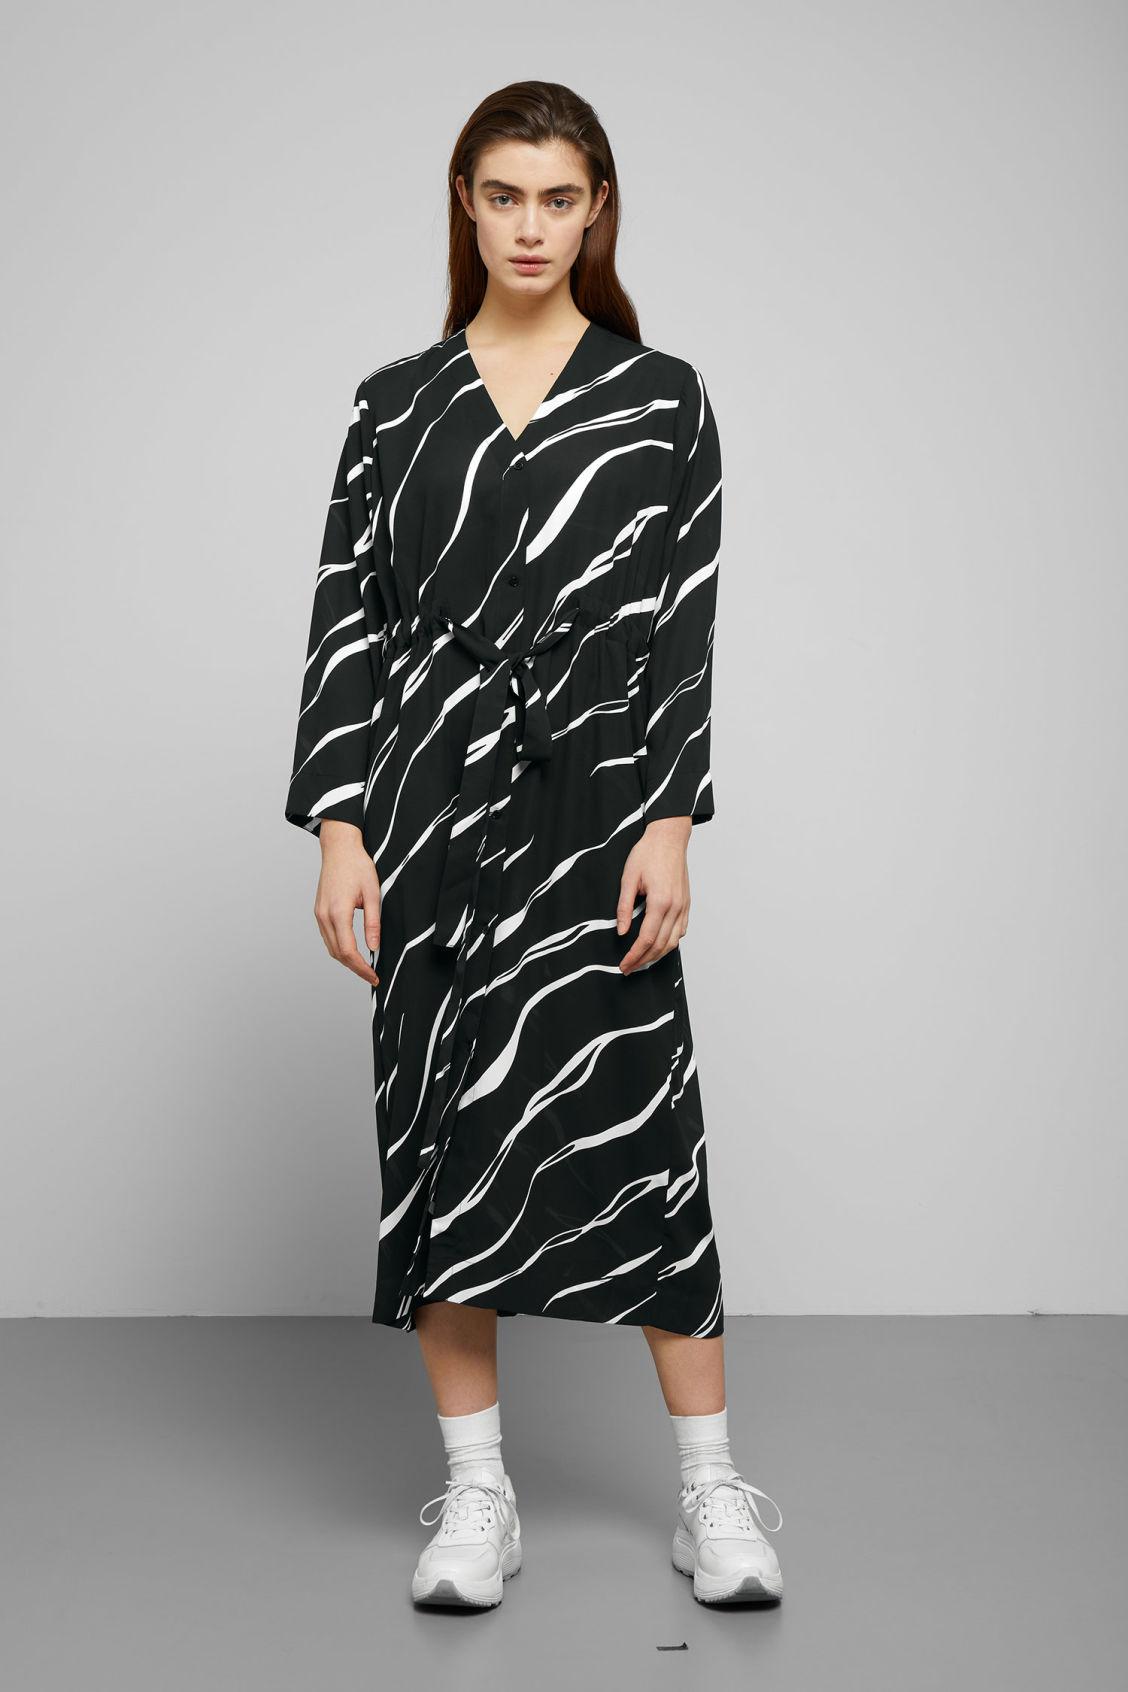 Weekday Sleeve Dressesamp; Chalk Dress Black Long Jumpsuits wPkuiZTOX